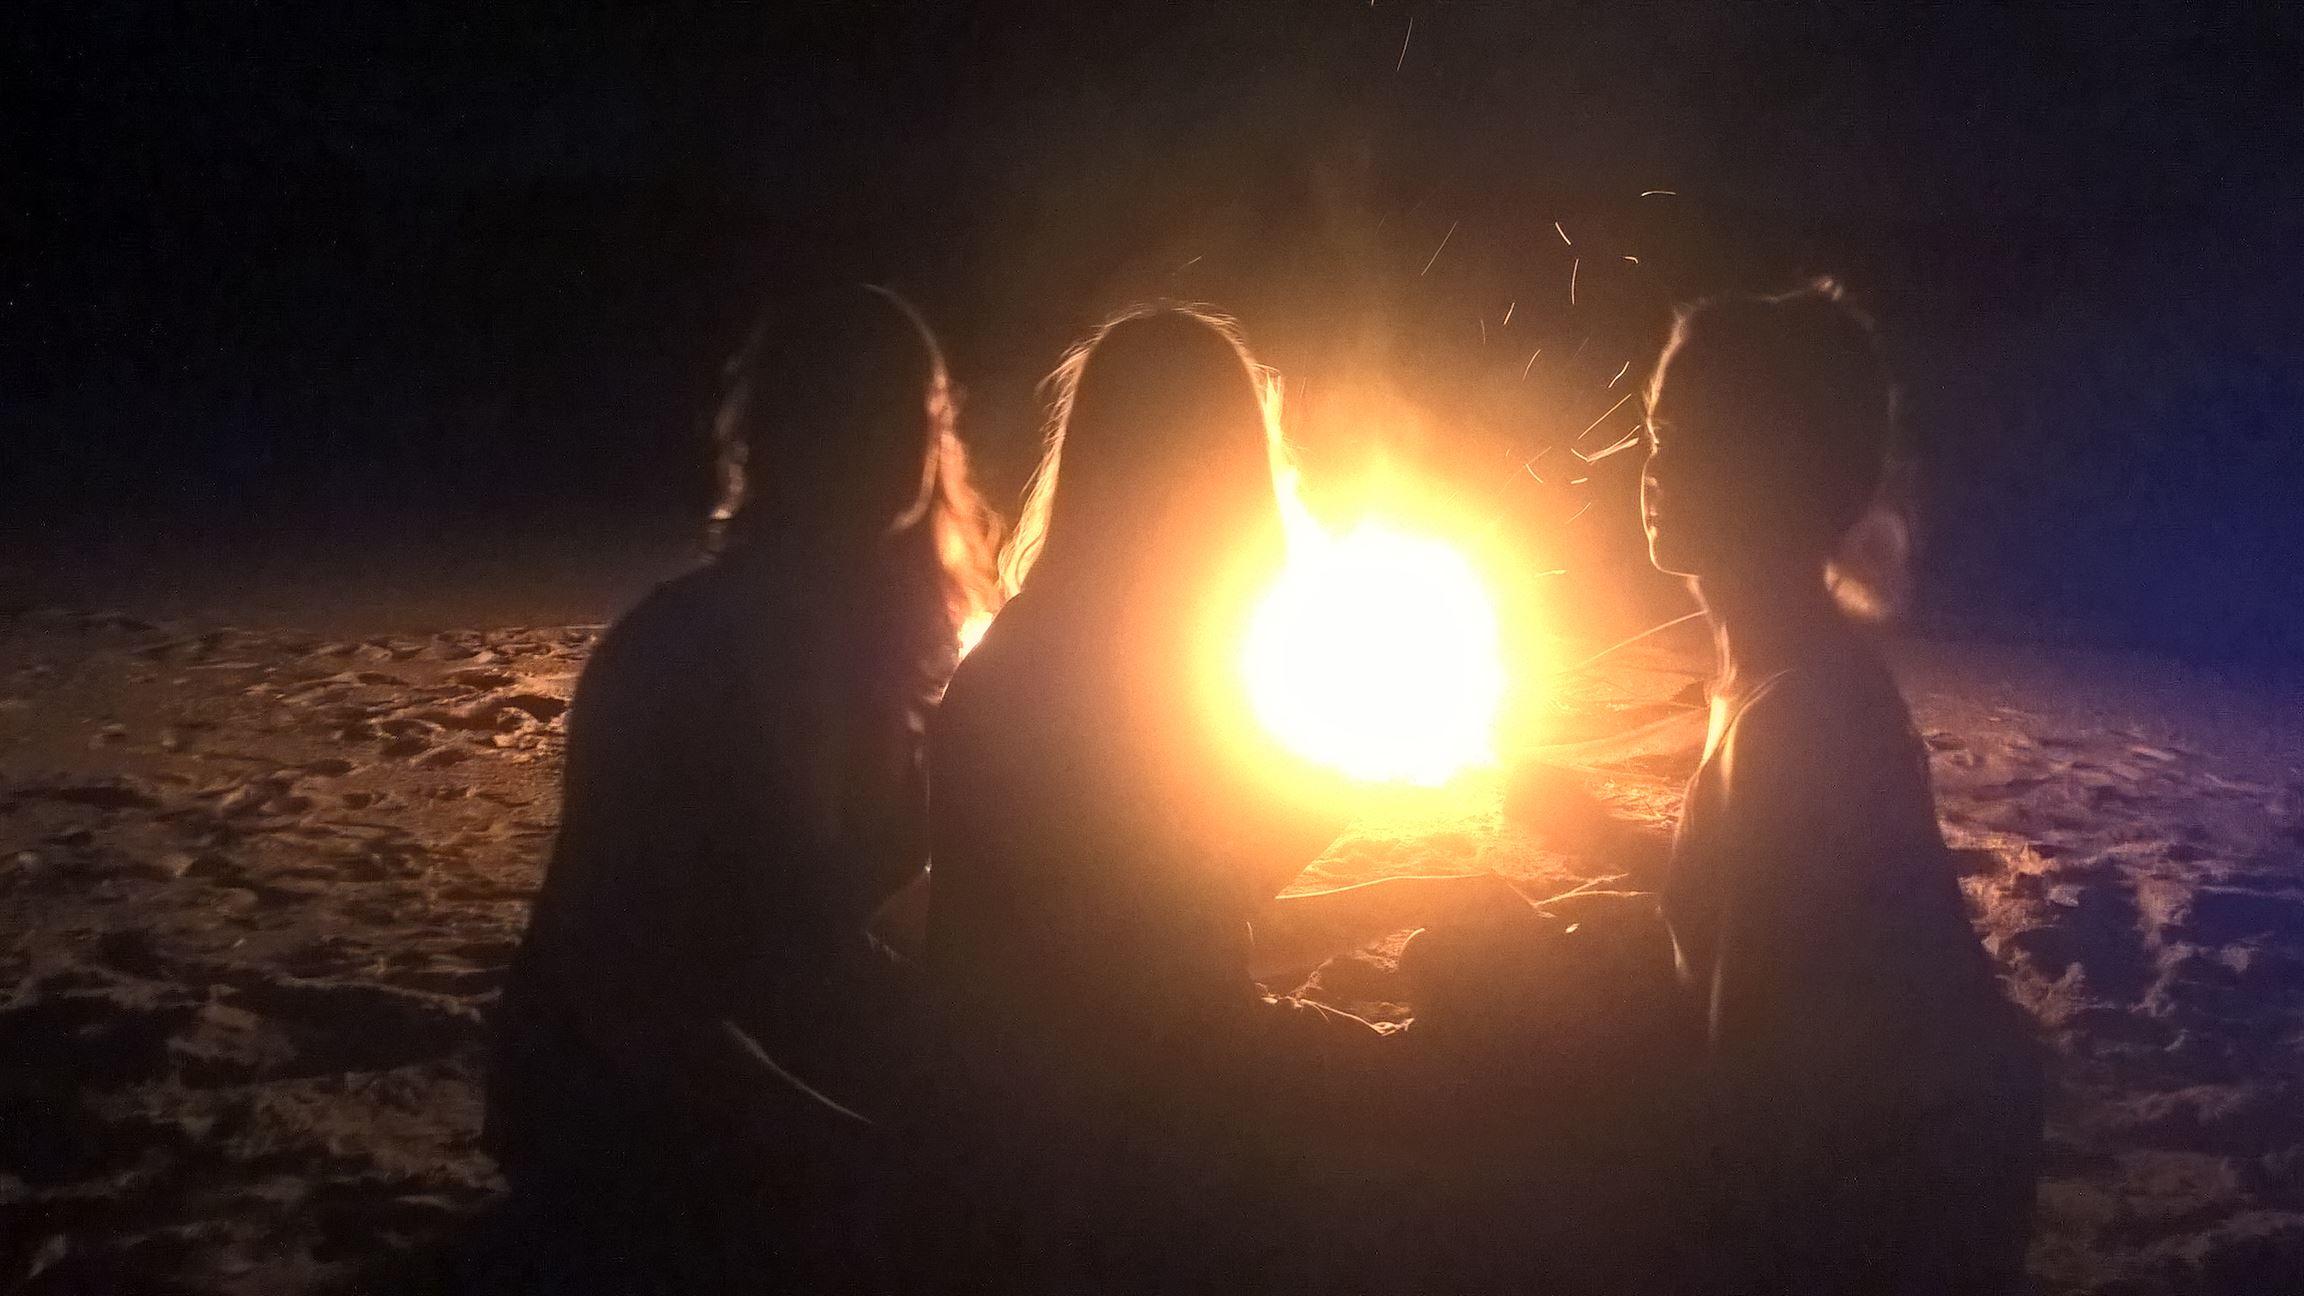 Possieren vor dem Feuer